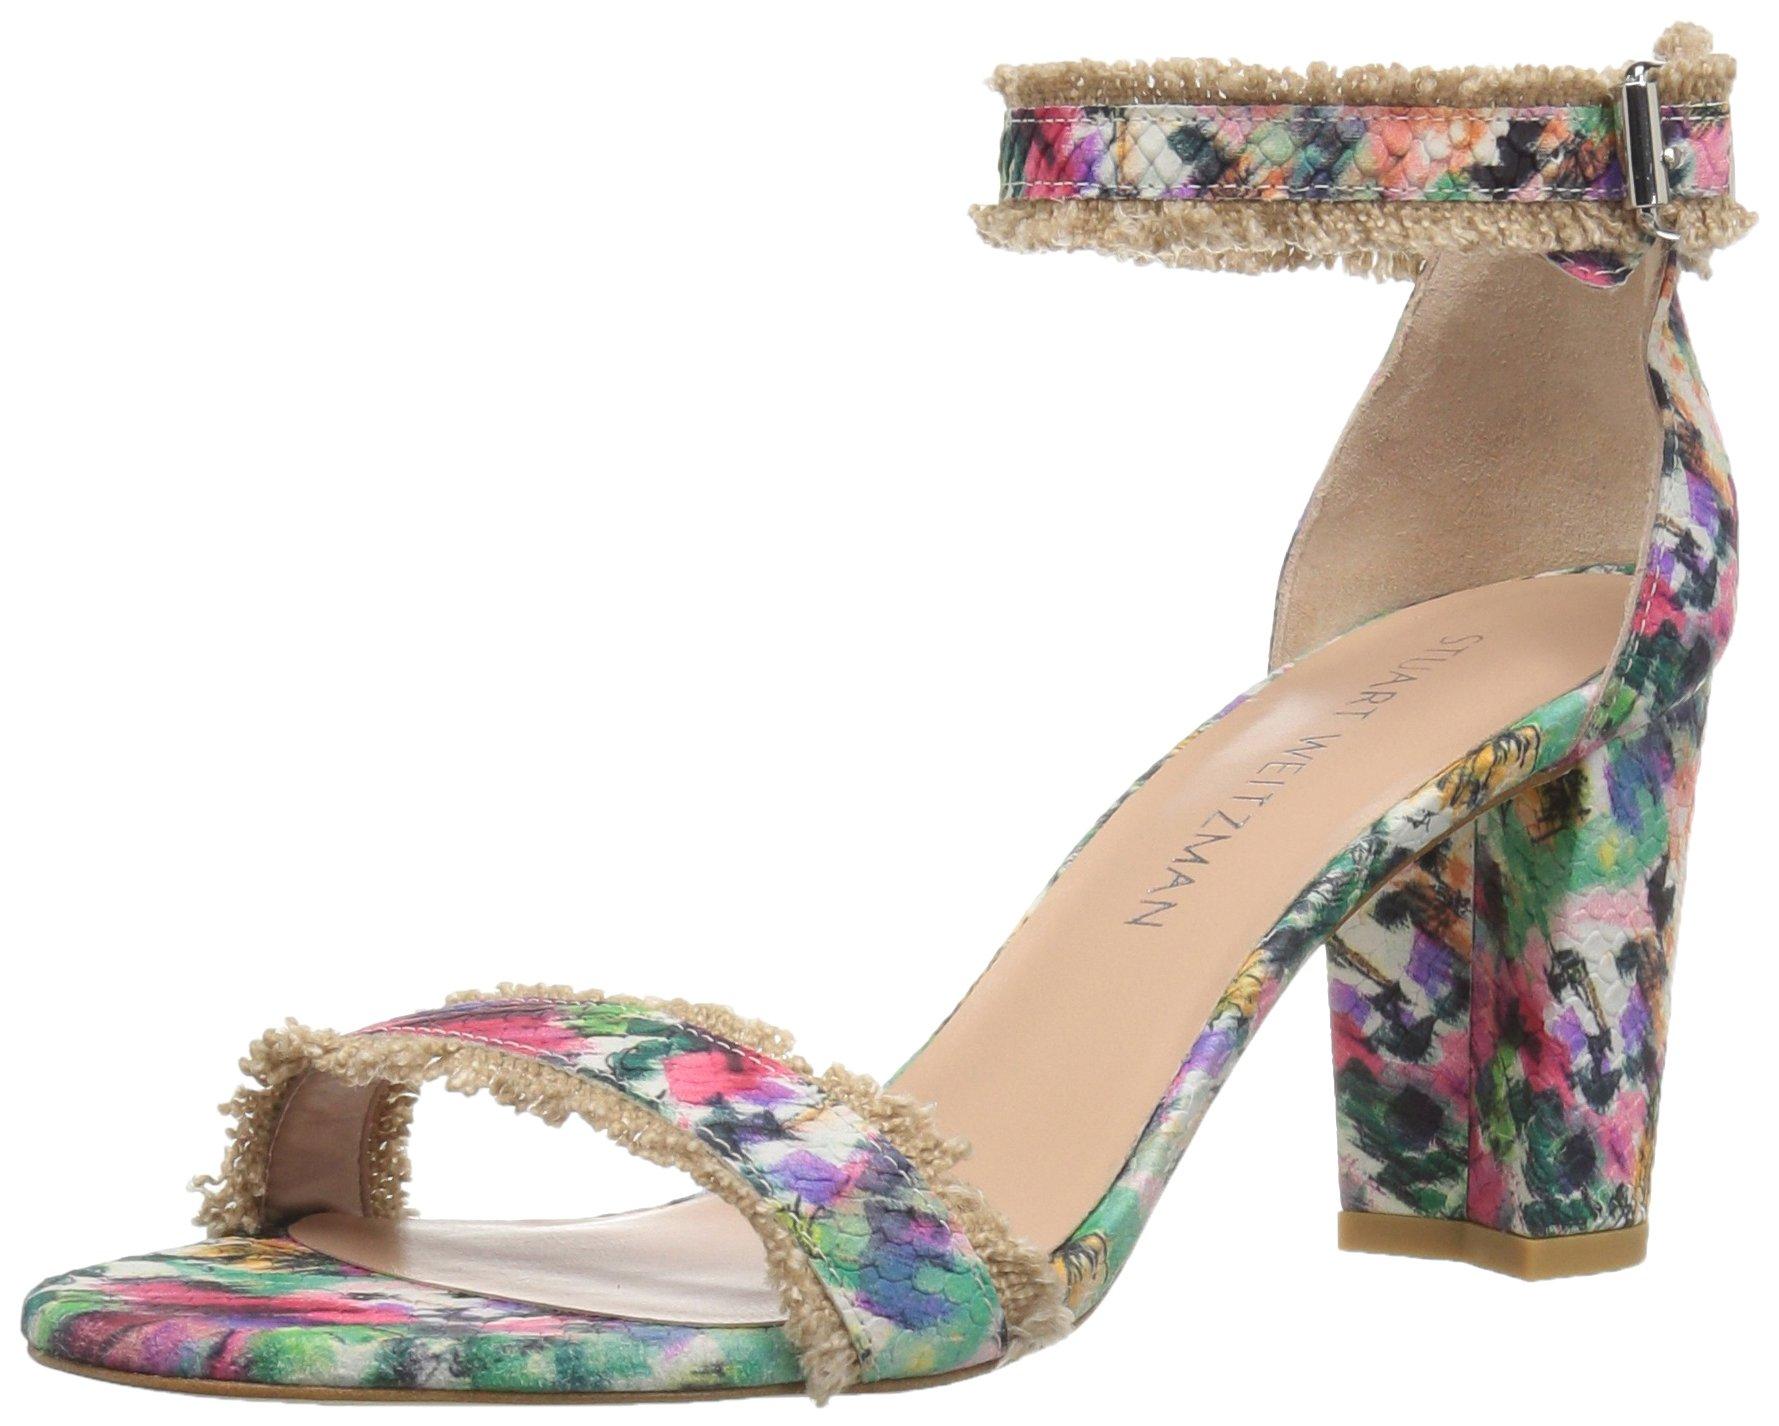 Stuart Weitzman Women's Frayed Heeled Sandal, Bright, 8.5 M US